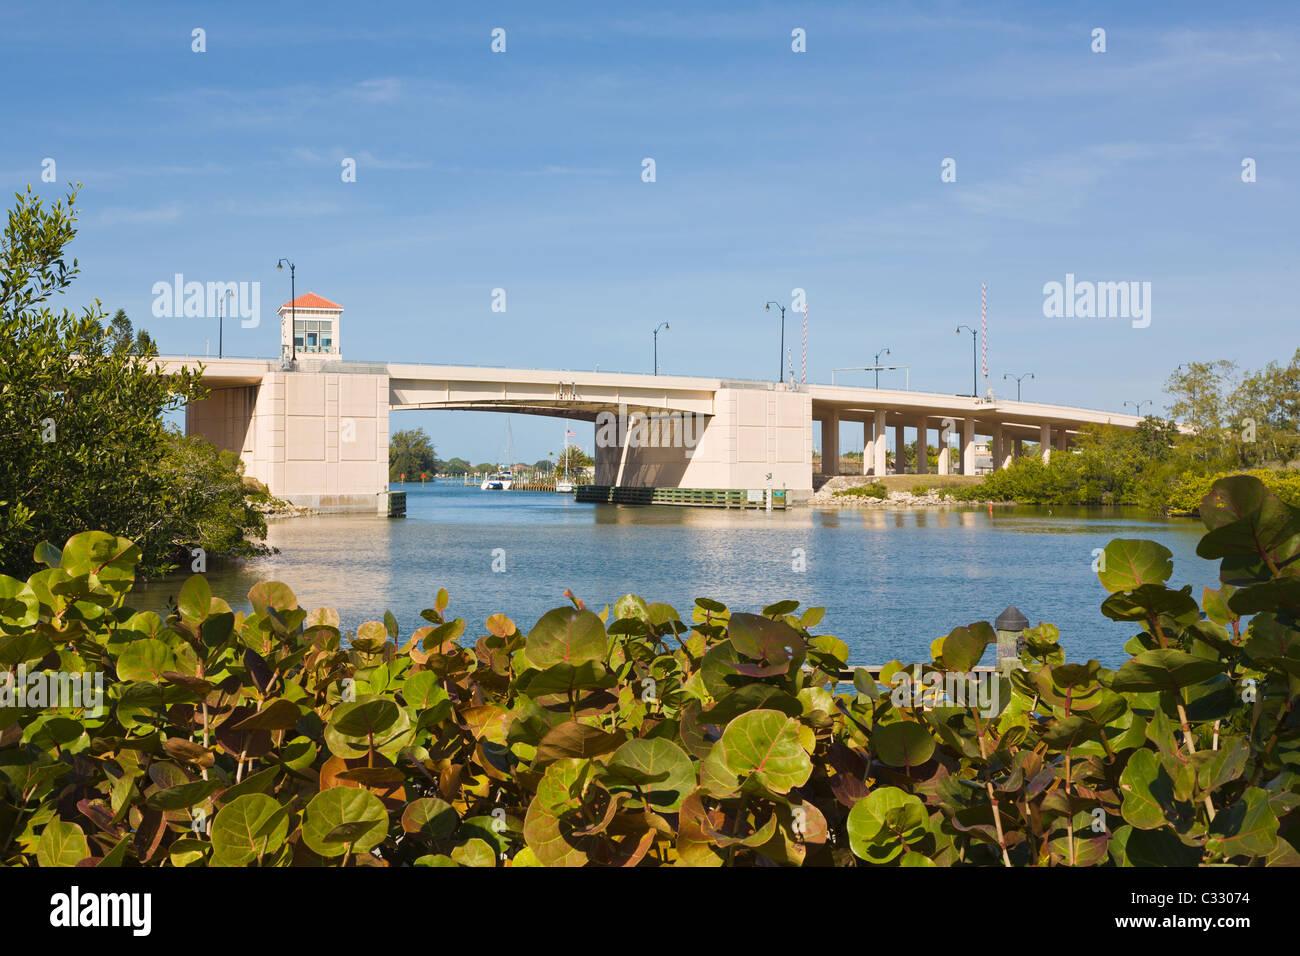 Lift bridge over Gulf Intercoastal Waterway in Venice Florida - Stock Image